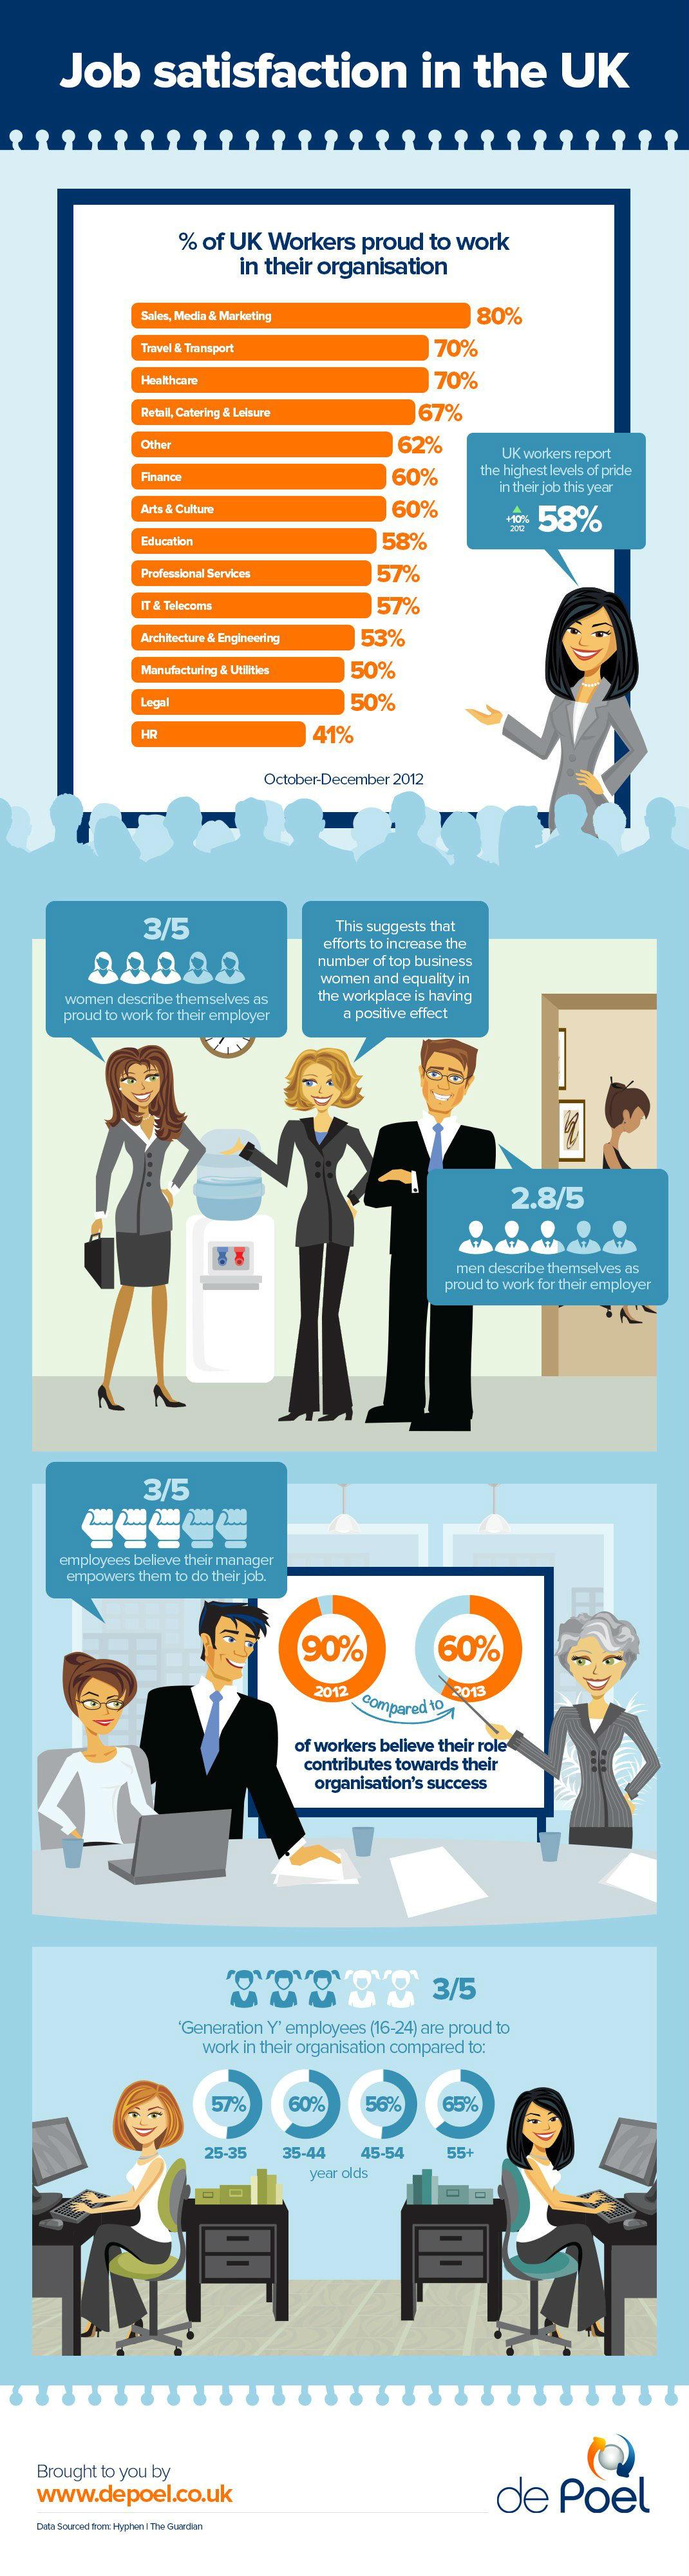 Put Job Satisfaction High On The Agenda [Infographic]